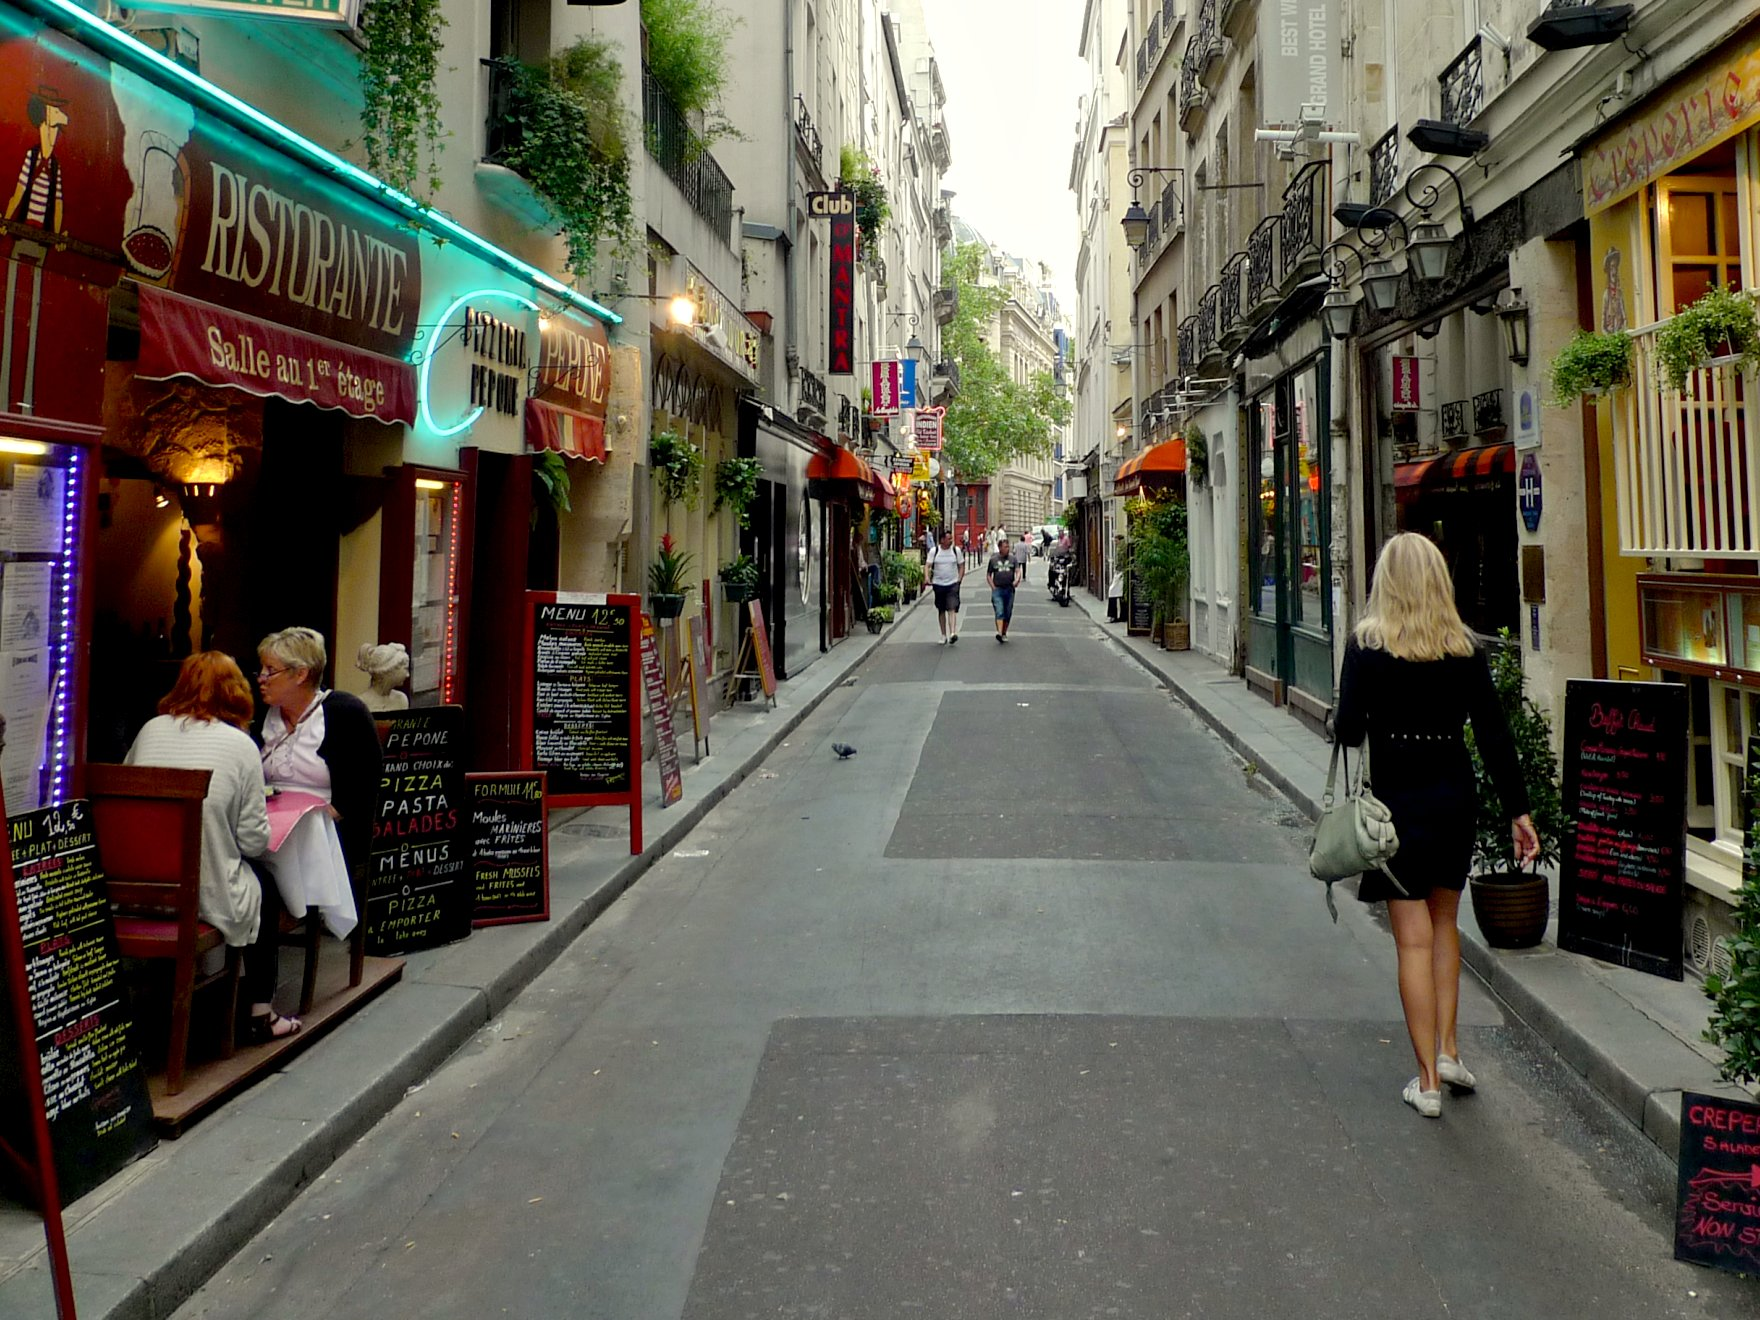 St Germain Hotels Paris  Star